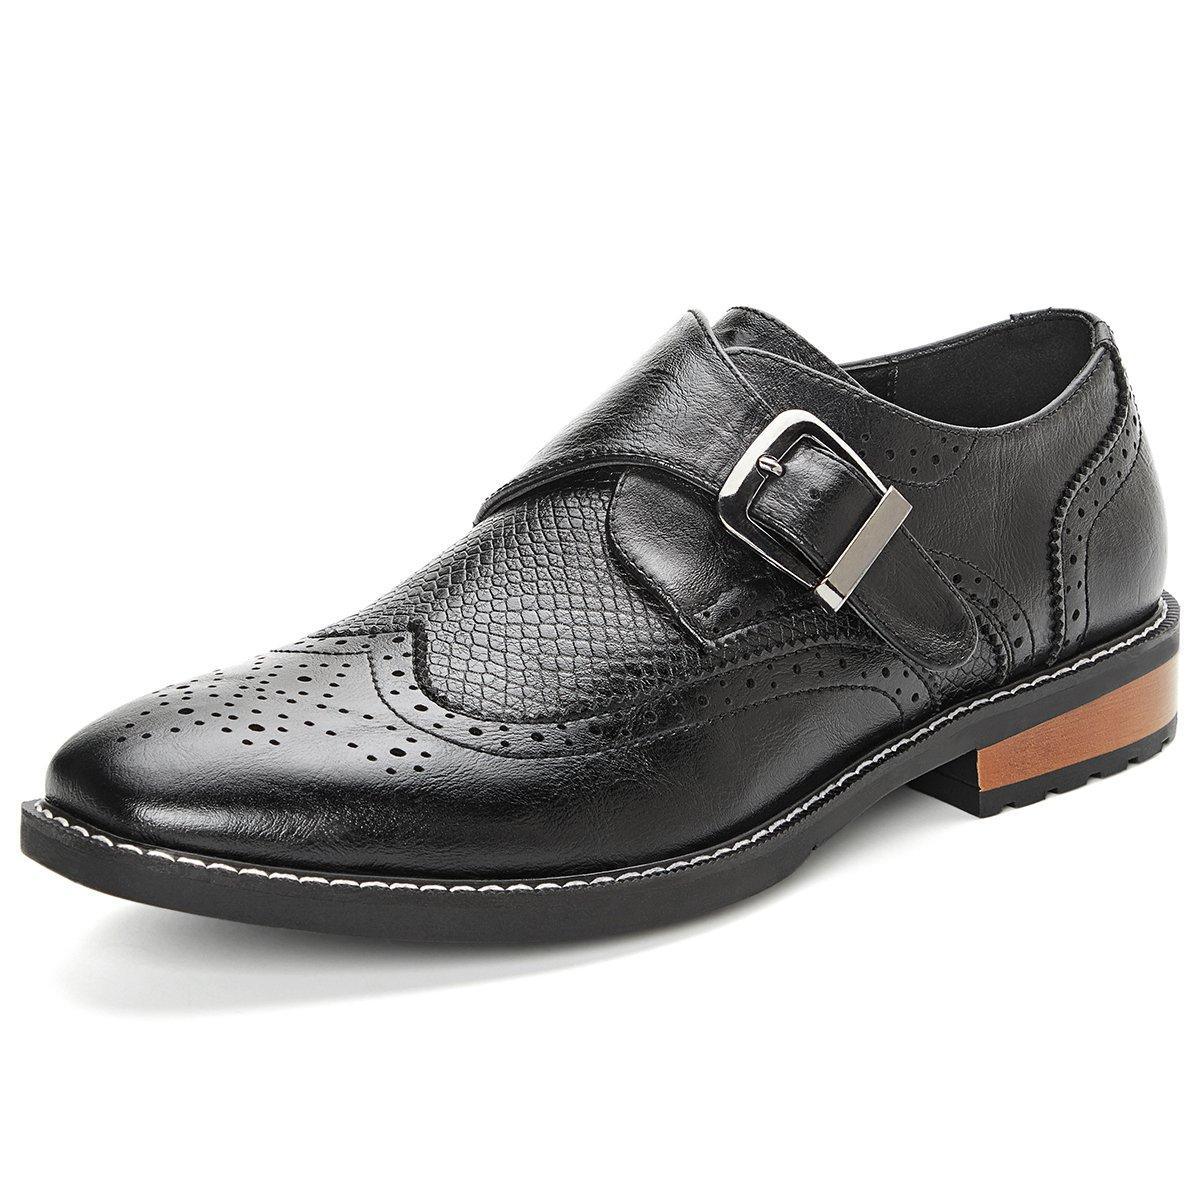 Men's Monk Strap Dress Shoes Wingtip Plaine Toe Single Buckle Slip on Loafer Black 12